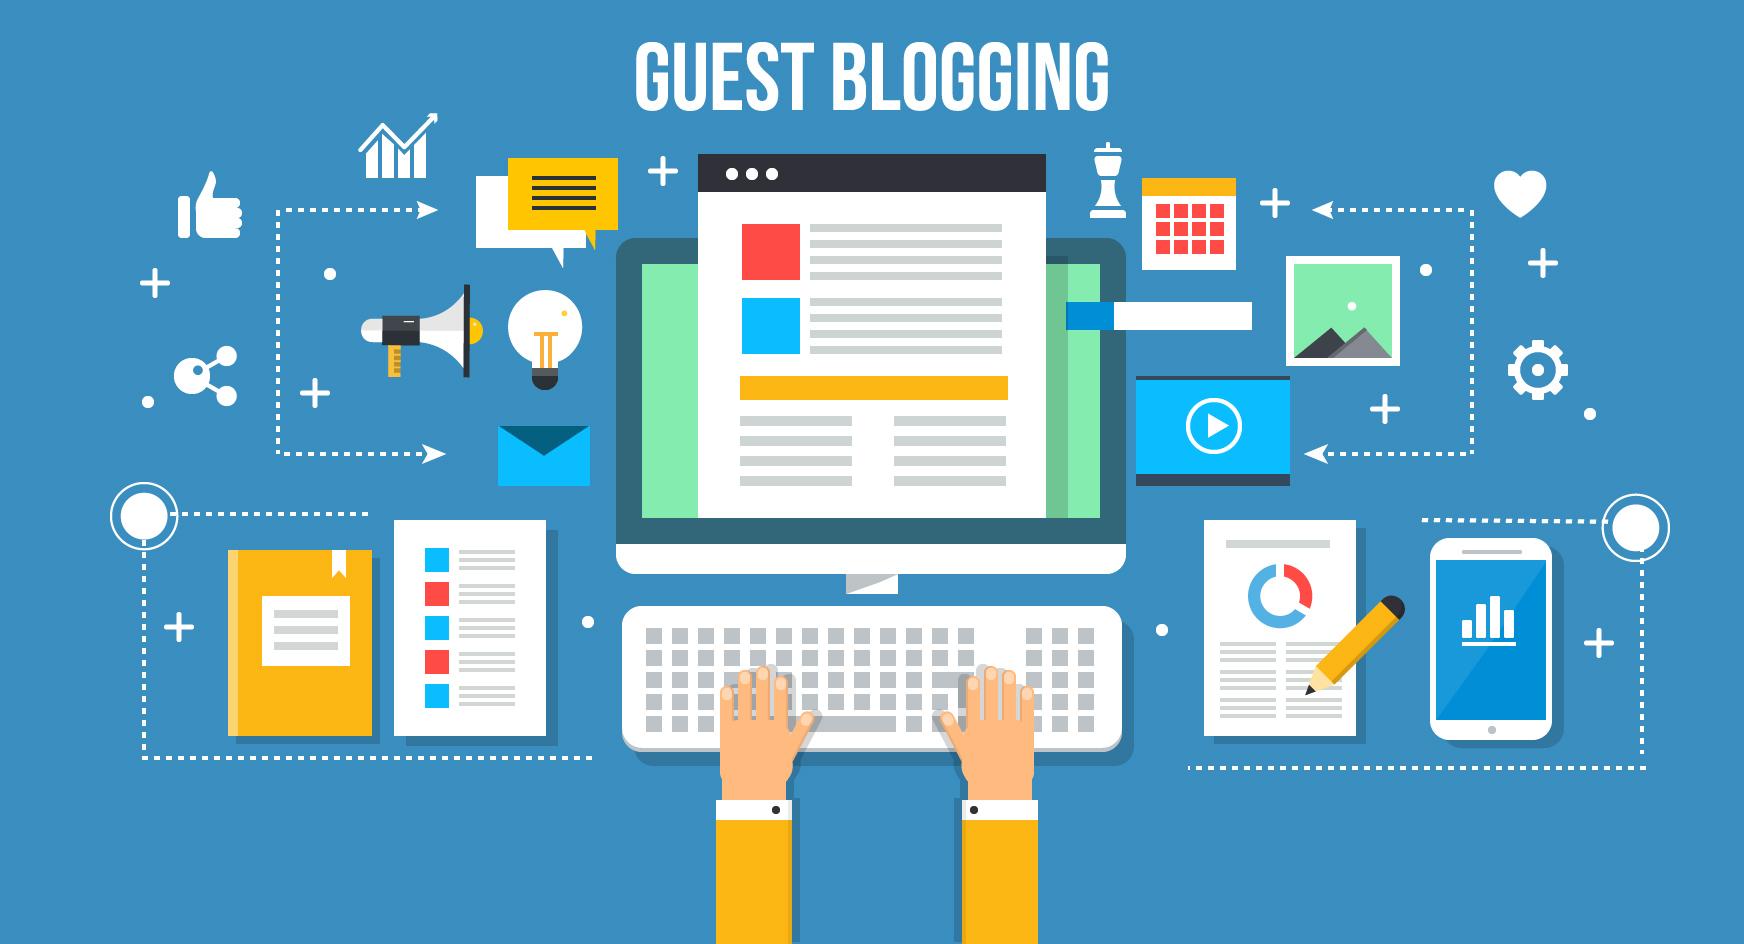 6 Major Benefits of Guest Blogging - AIVAnet